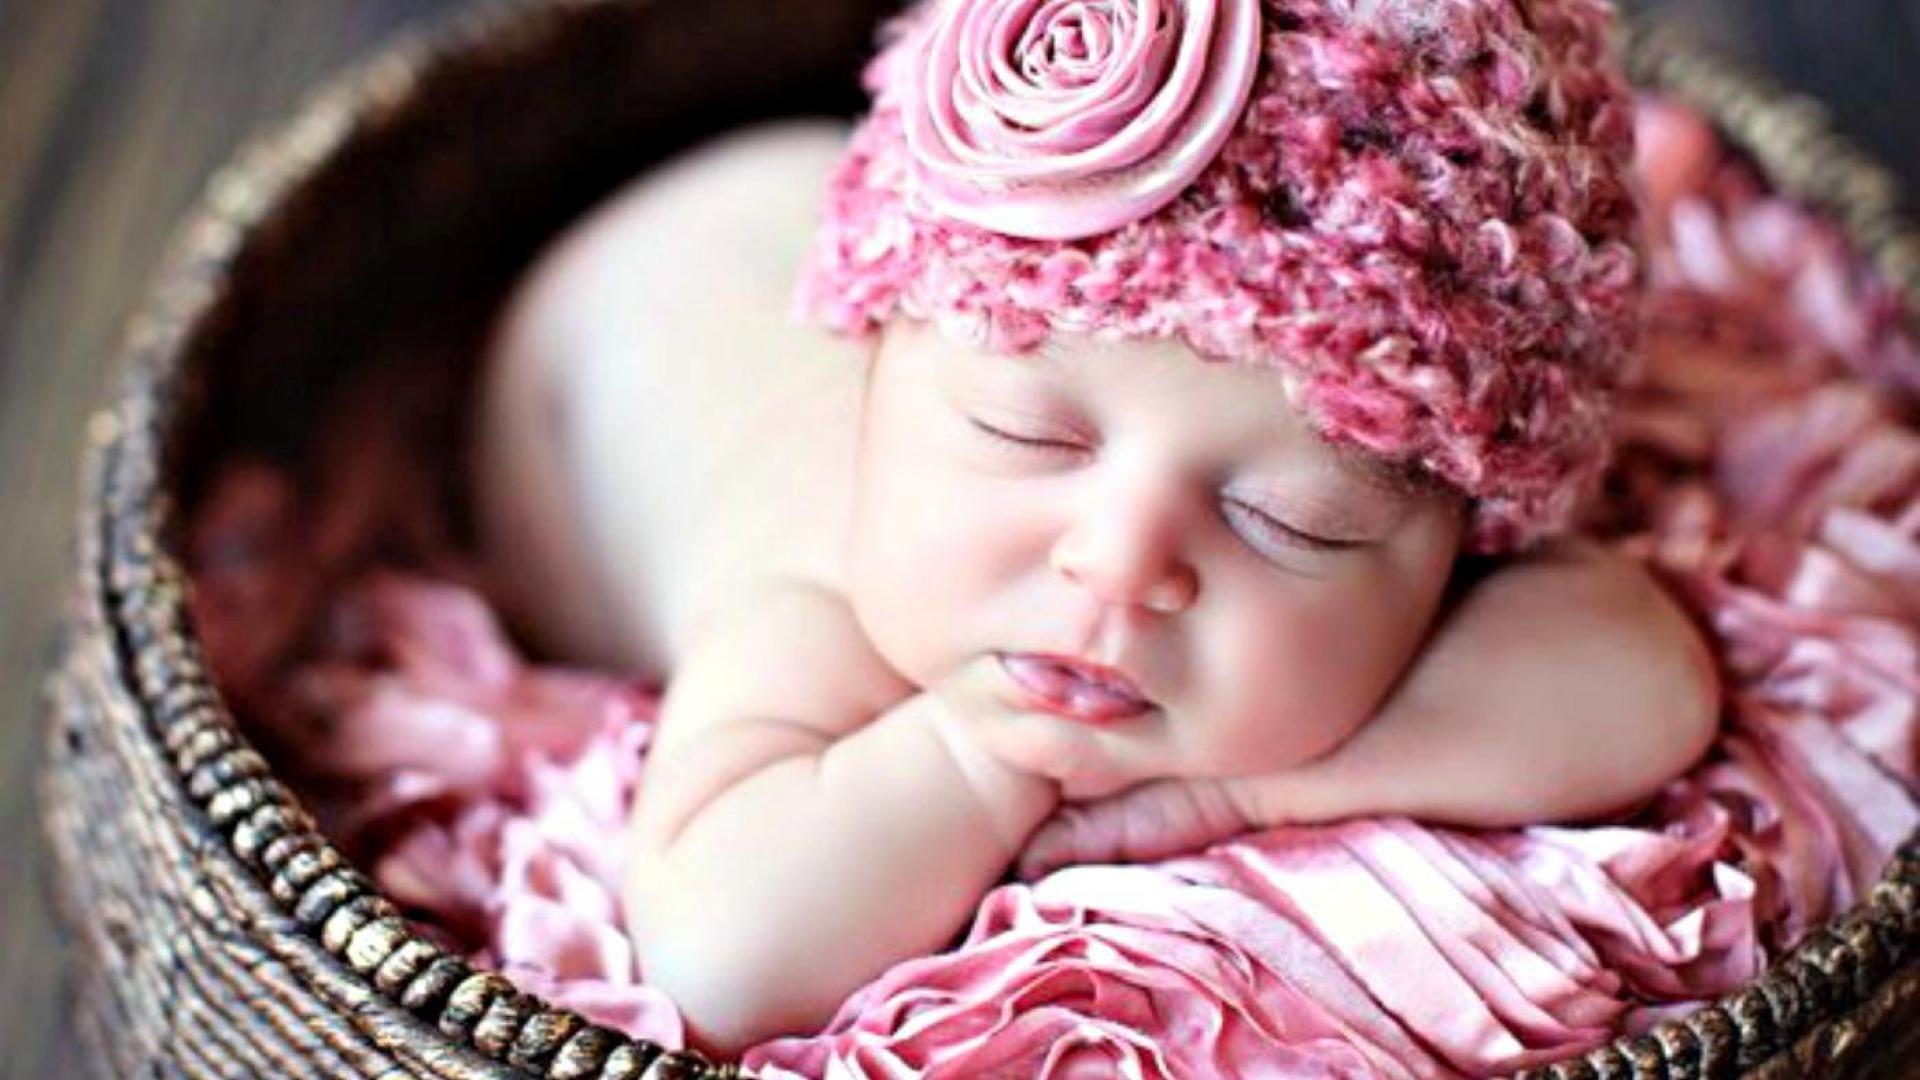 Cute Newborn Baby Wallpaper HD Free Download Fond Decran Large Photo D